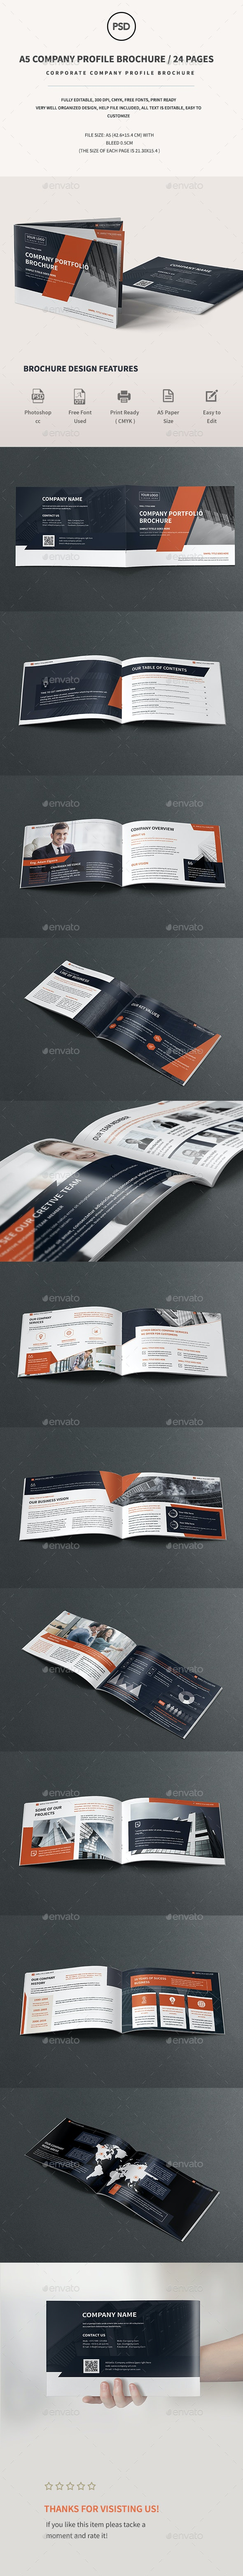 A5 Corporate Company Brochure  - Corporate Brochures